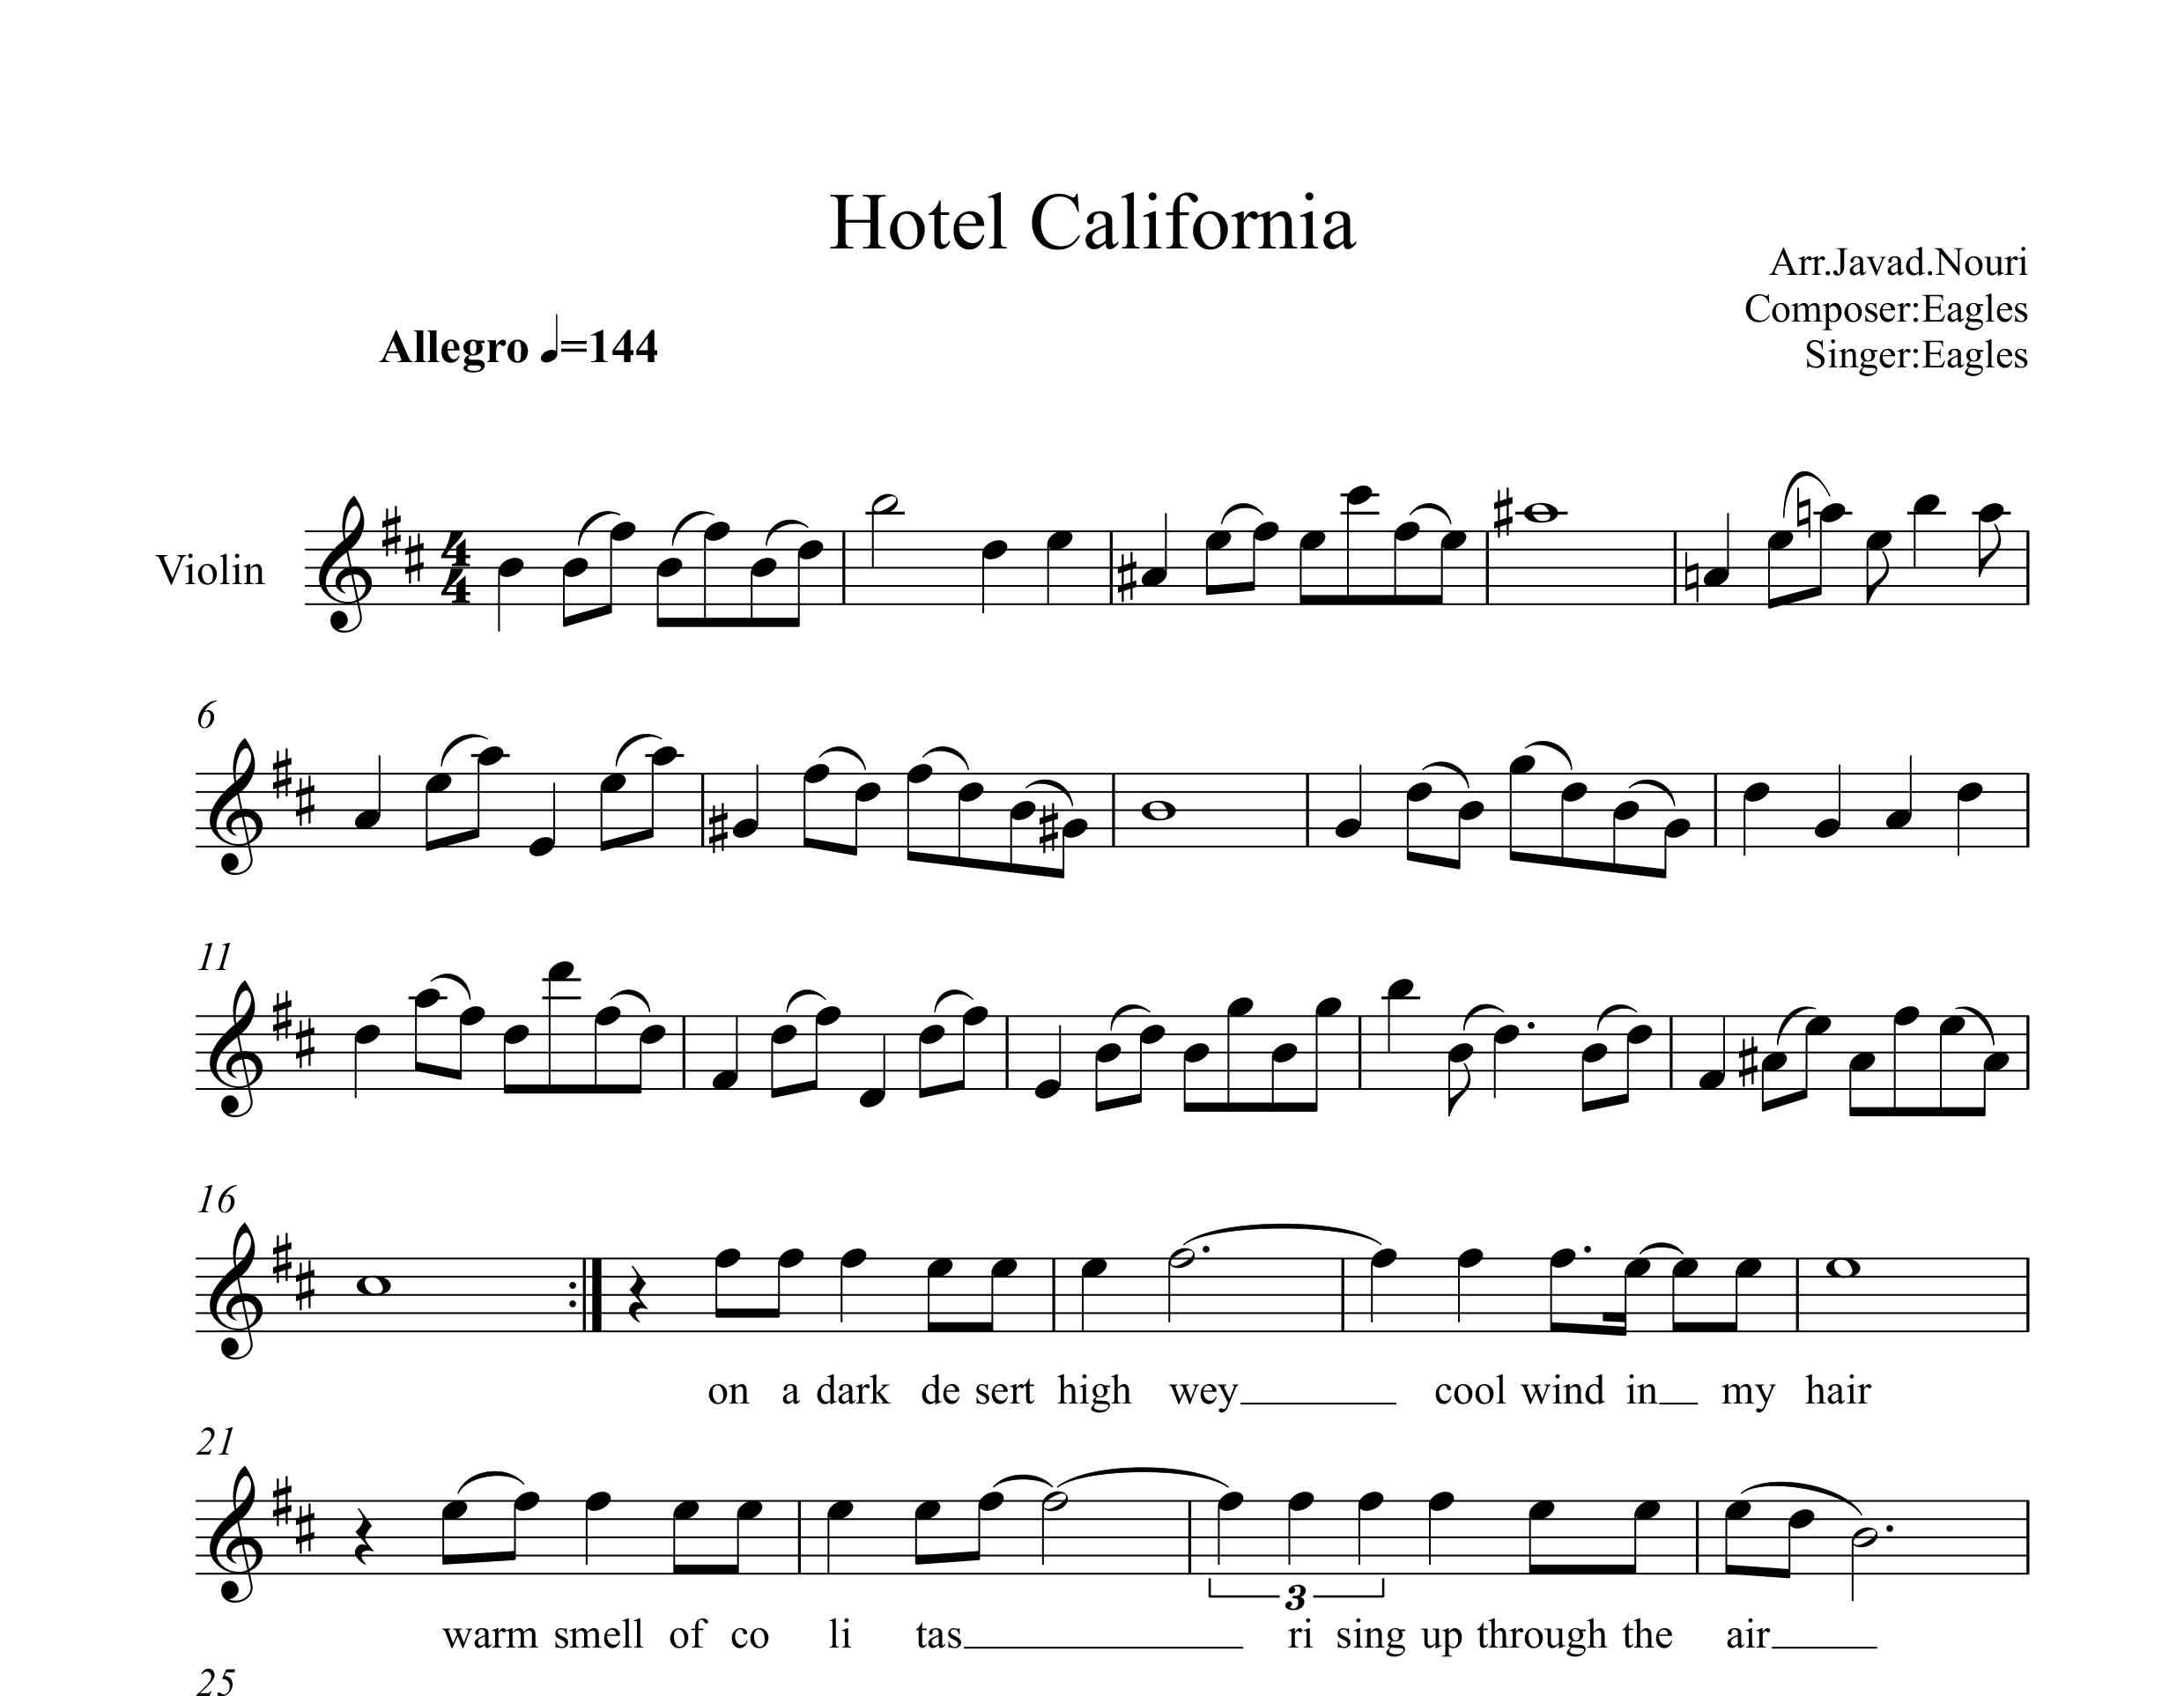 نت ویولن آهنگ هتل کالیفرنیا